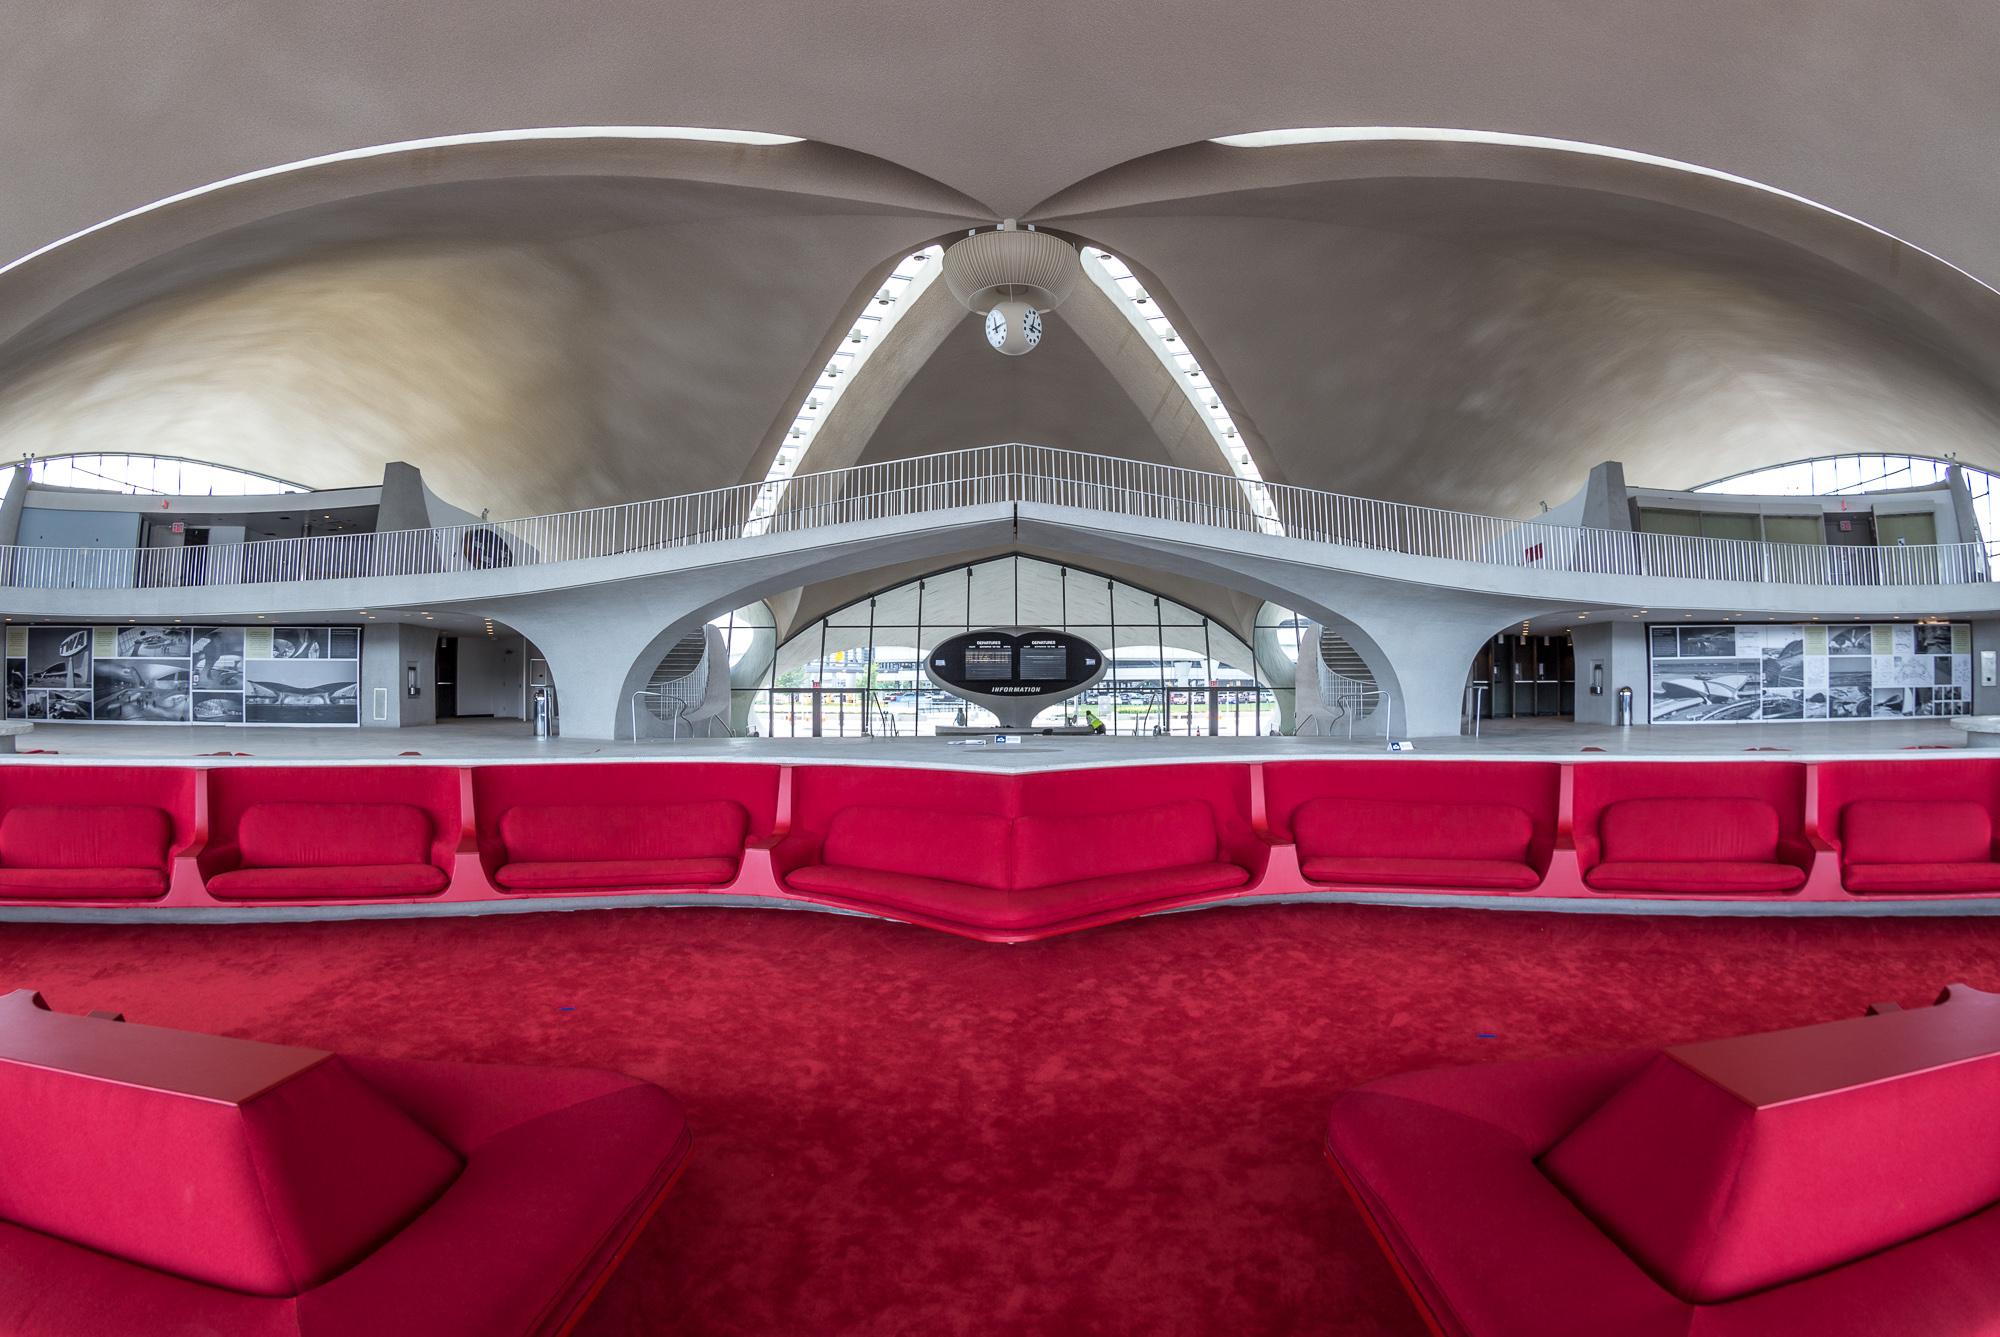 Explore the TWA Terminal, a Pristine Time Capsule From 1962